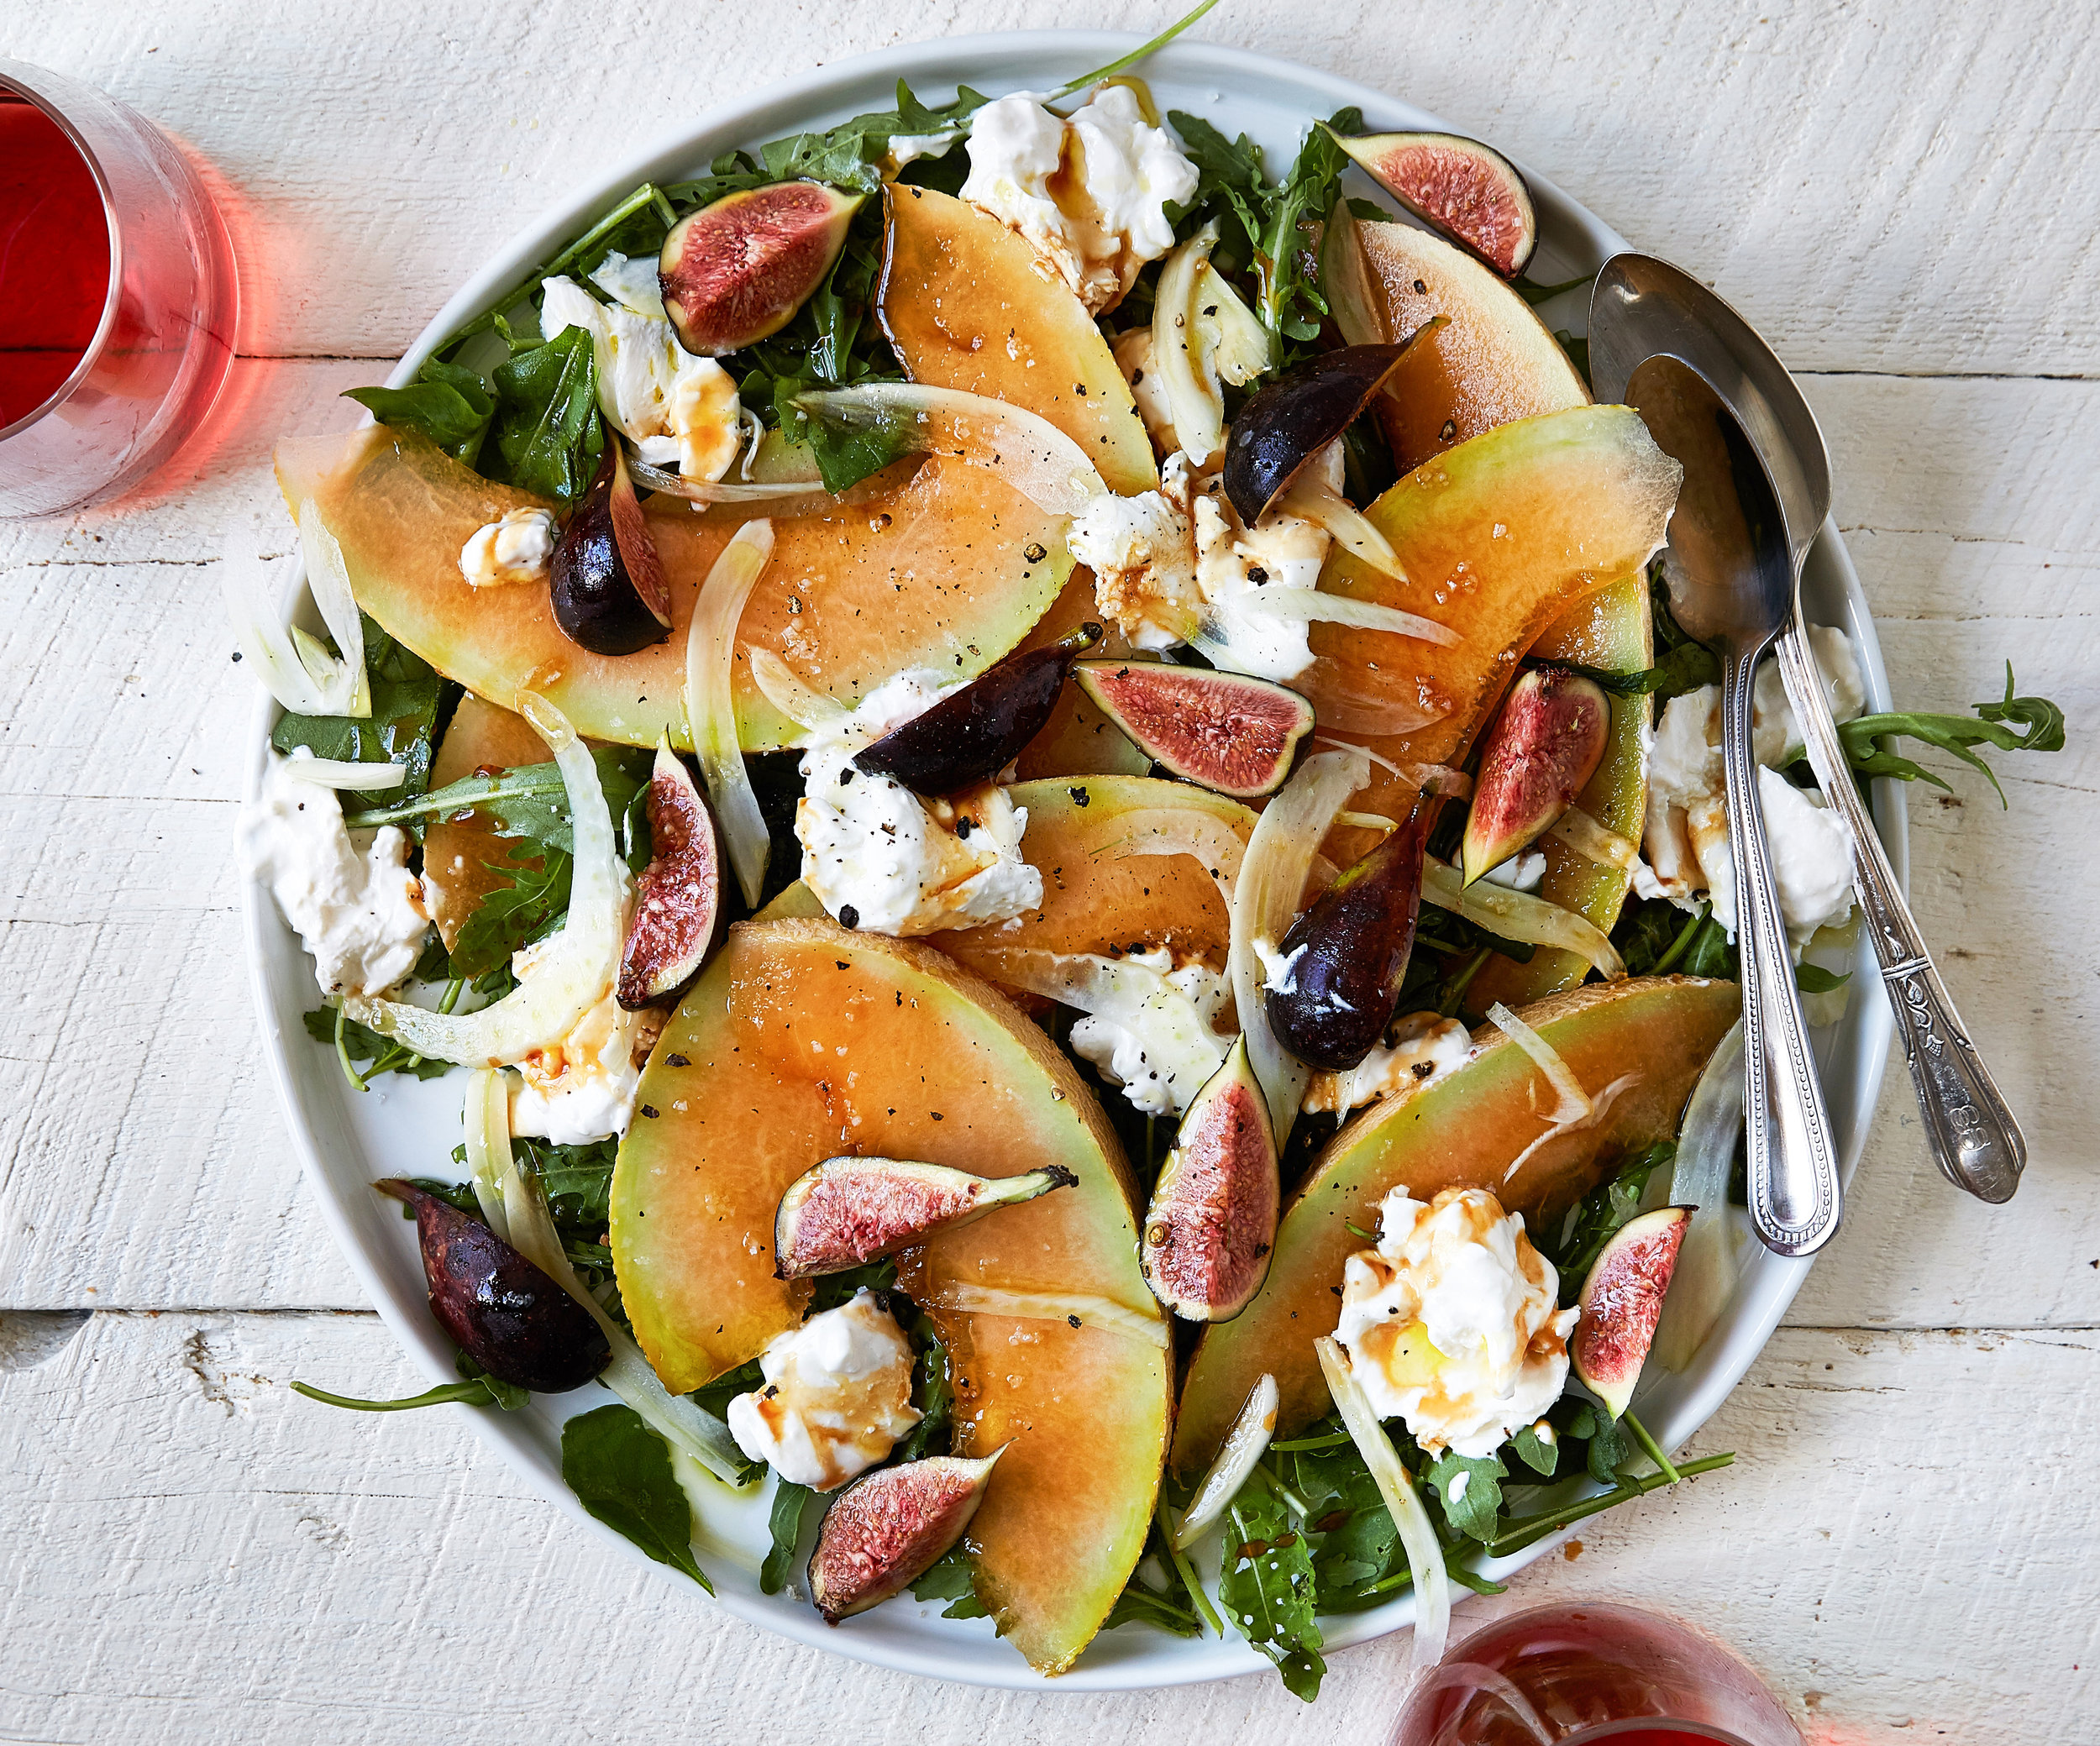 GTAM-burrata-cantaloupe-salad-5.jpg